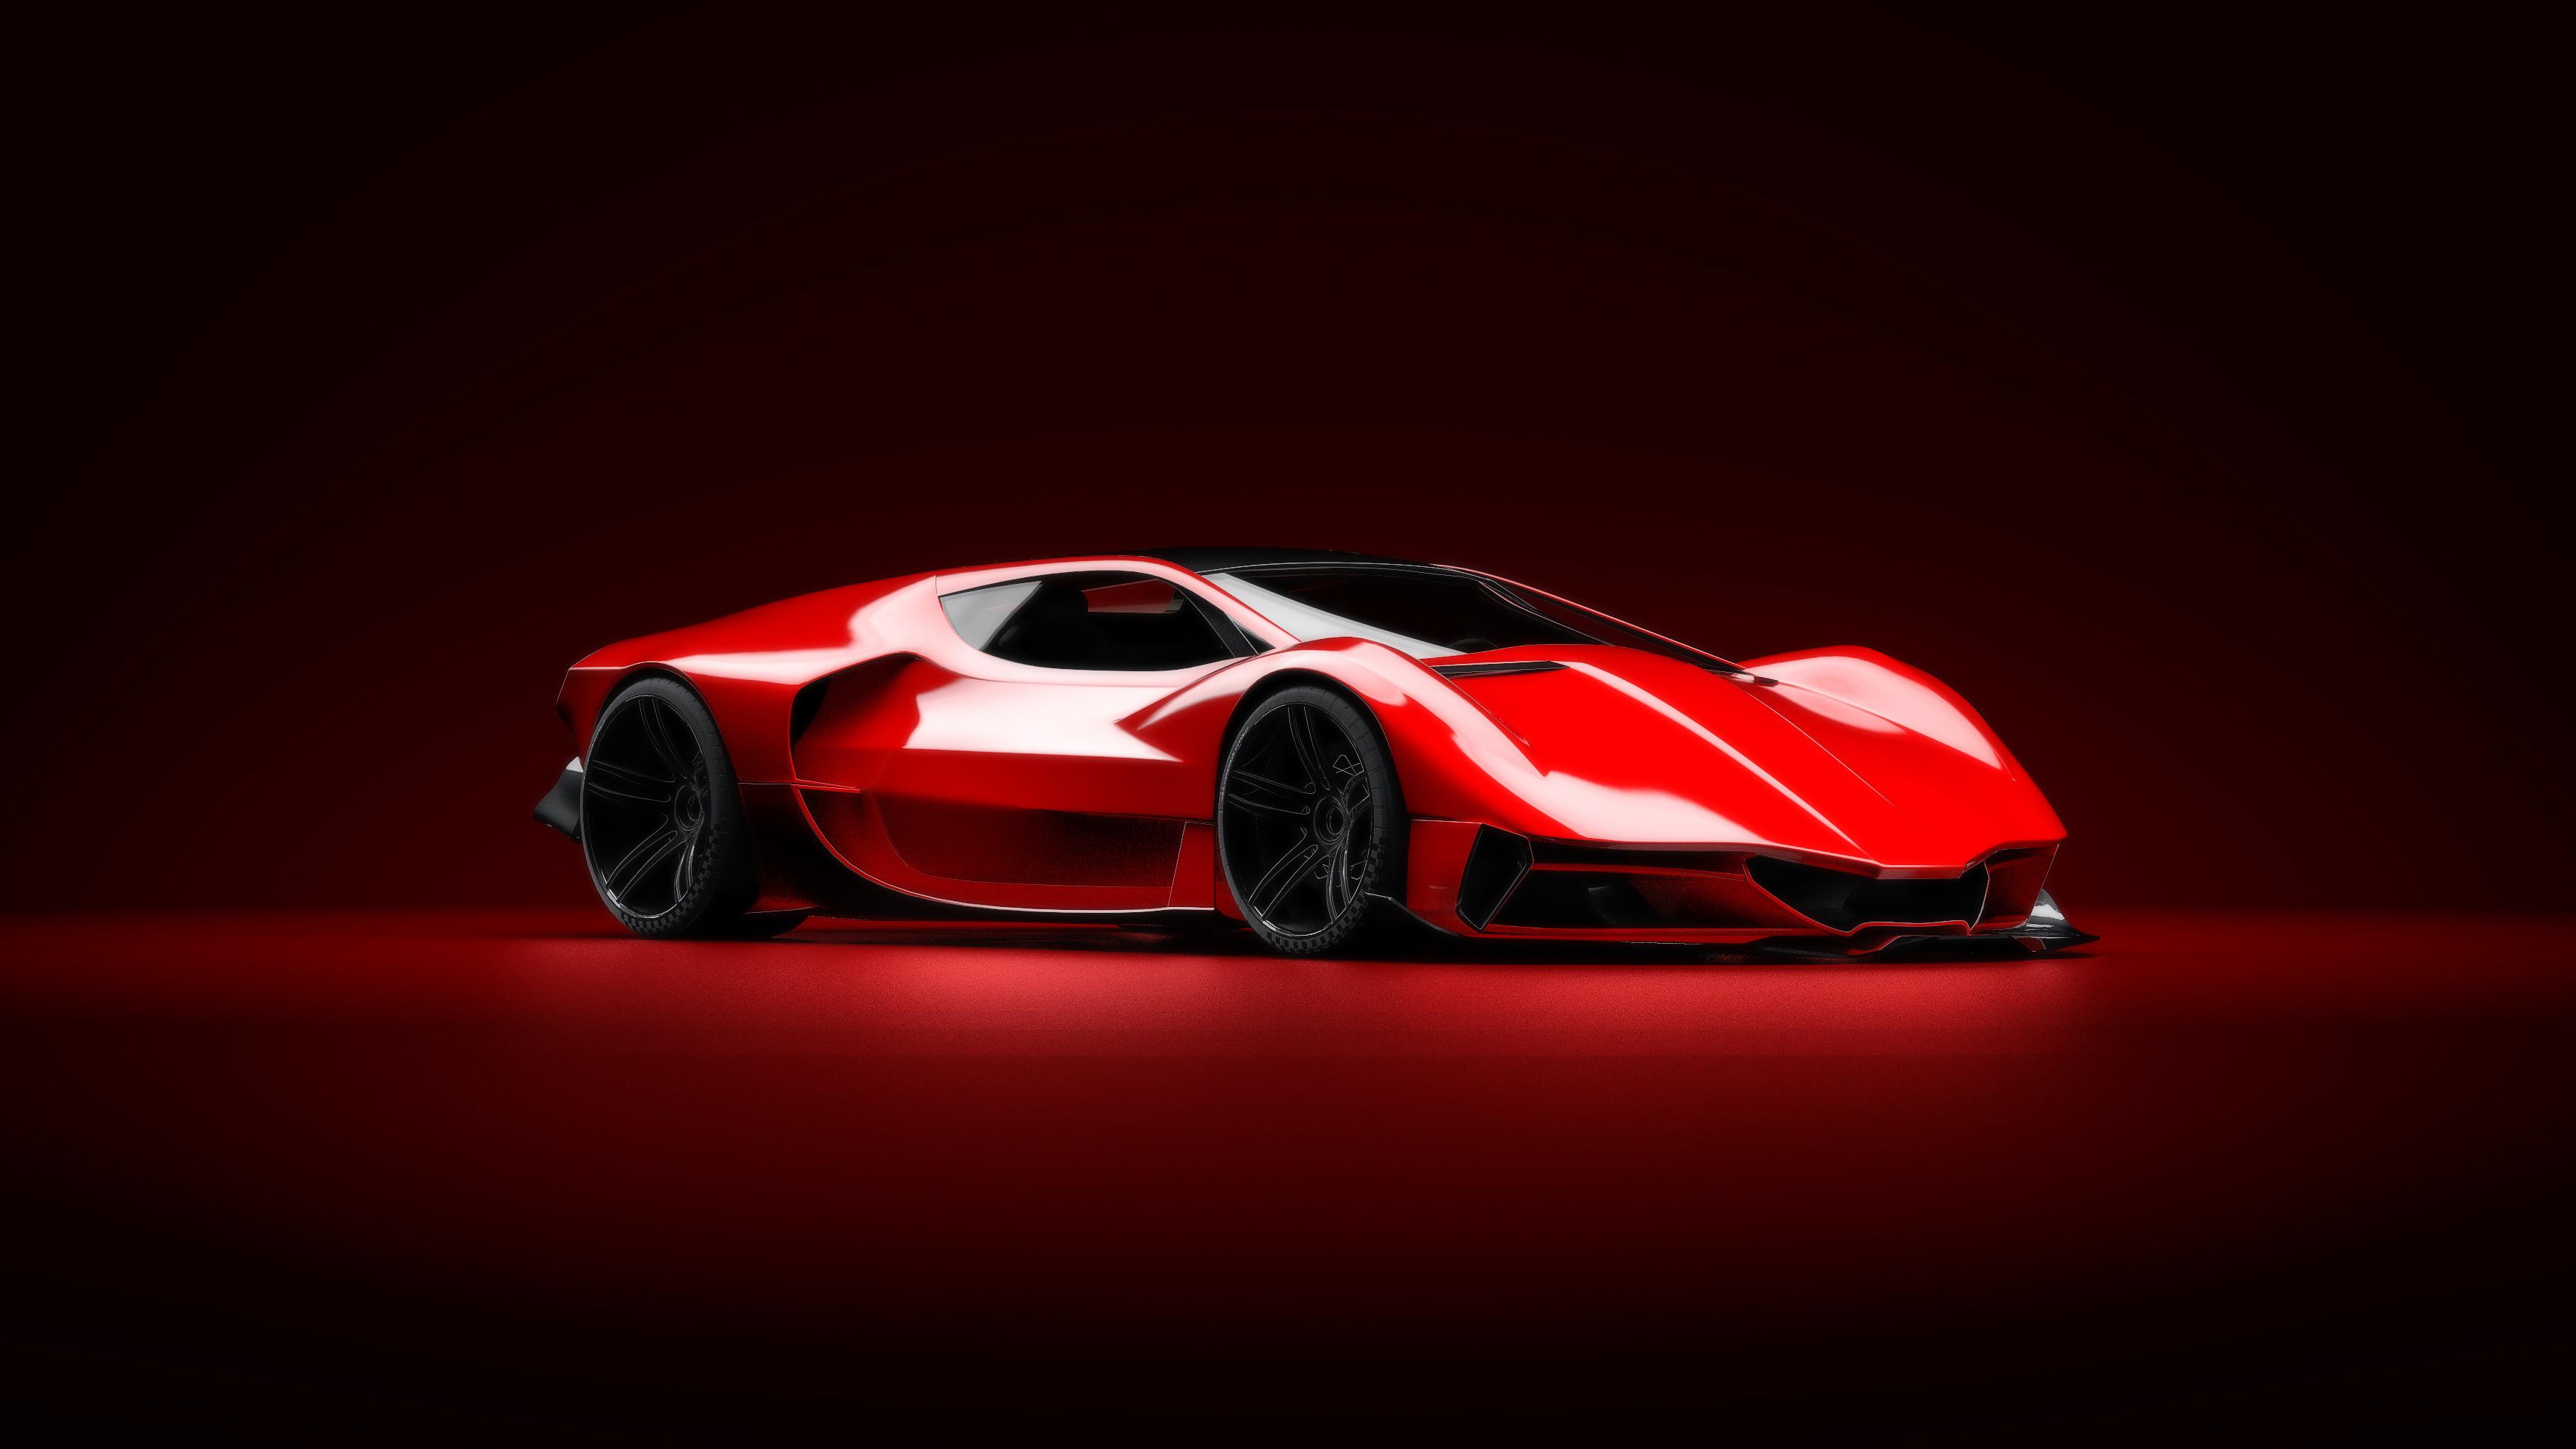 Lamborghini Countach Front, HD Cars, 4k Wallpapers, Images ...